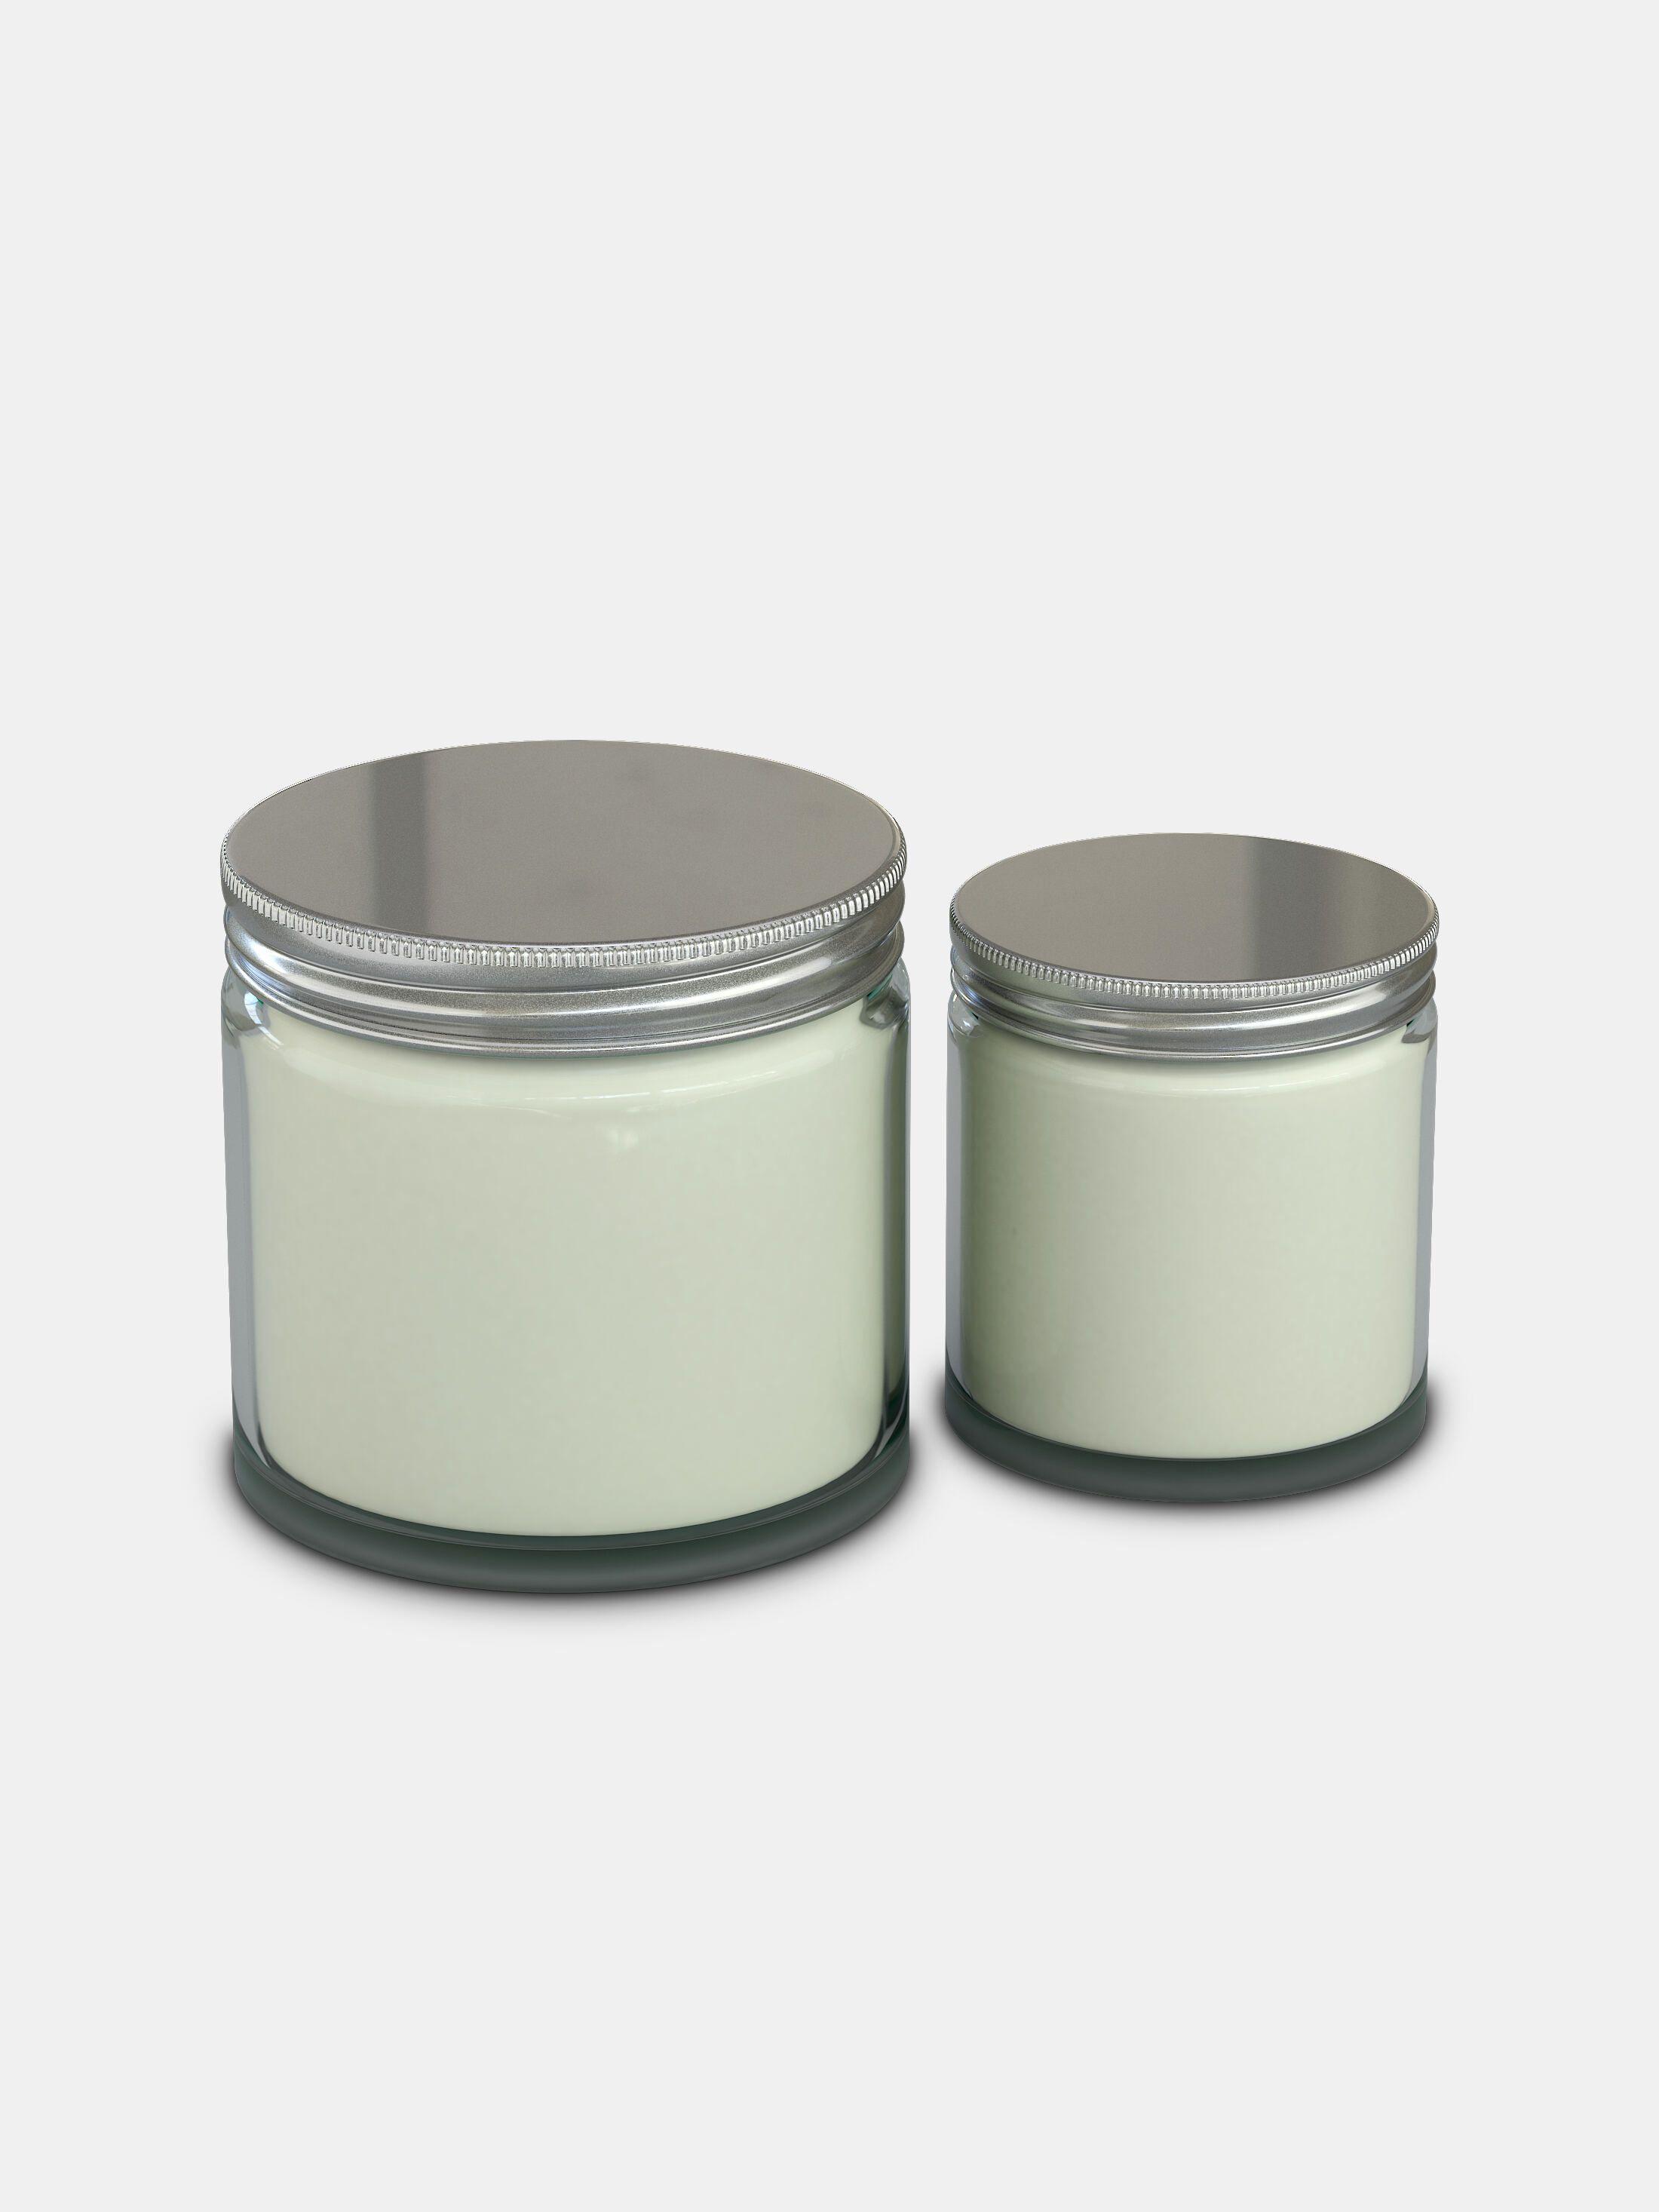 Custom Candle Jars With Lids NZ